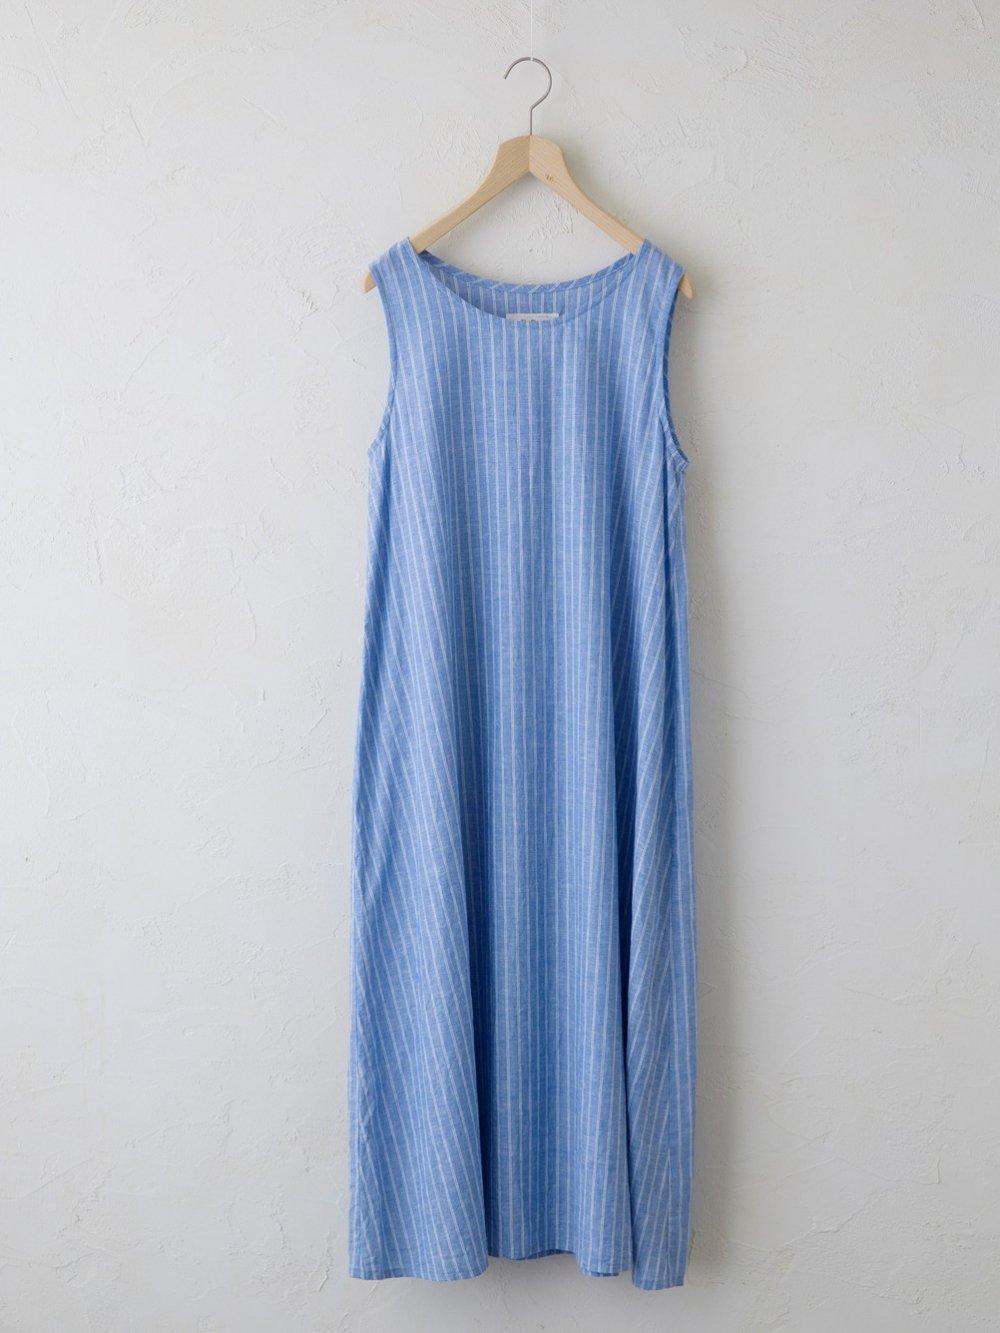 Cotton Linen Stripe レイヤードワンピース